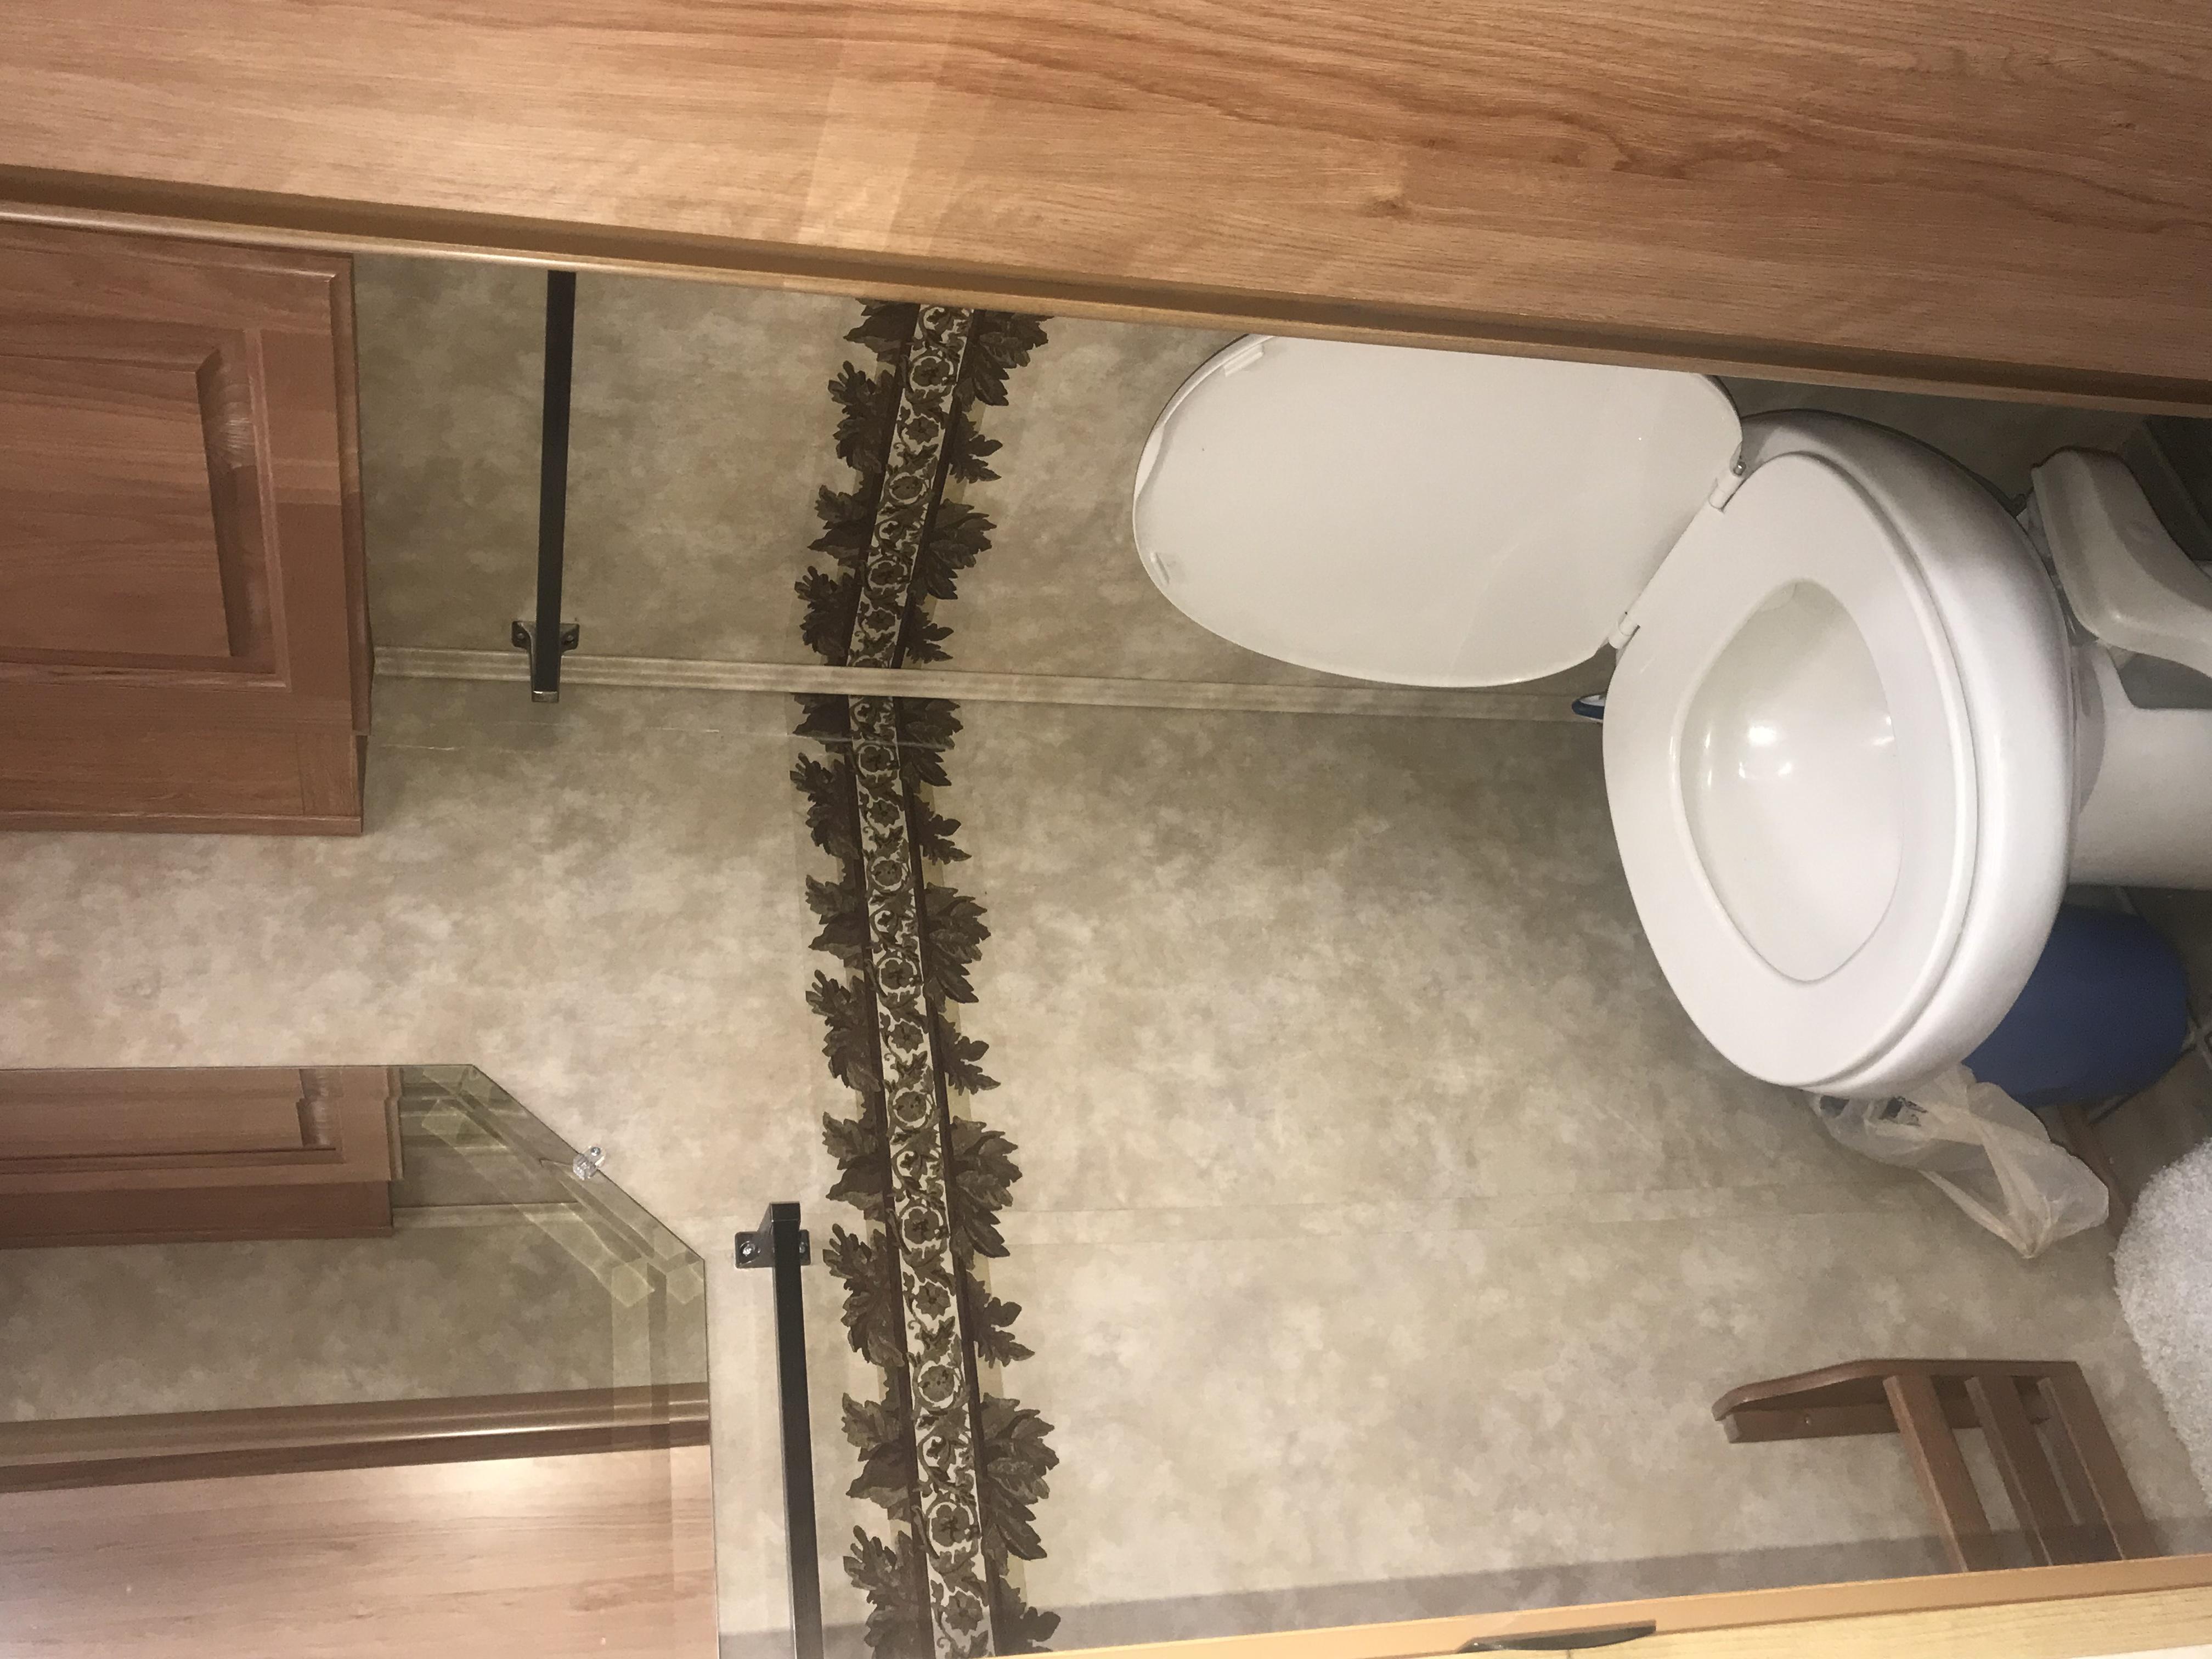 Private toilet room. Jayco Eagle 2008